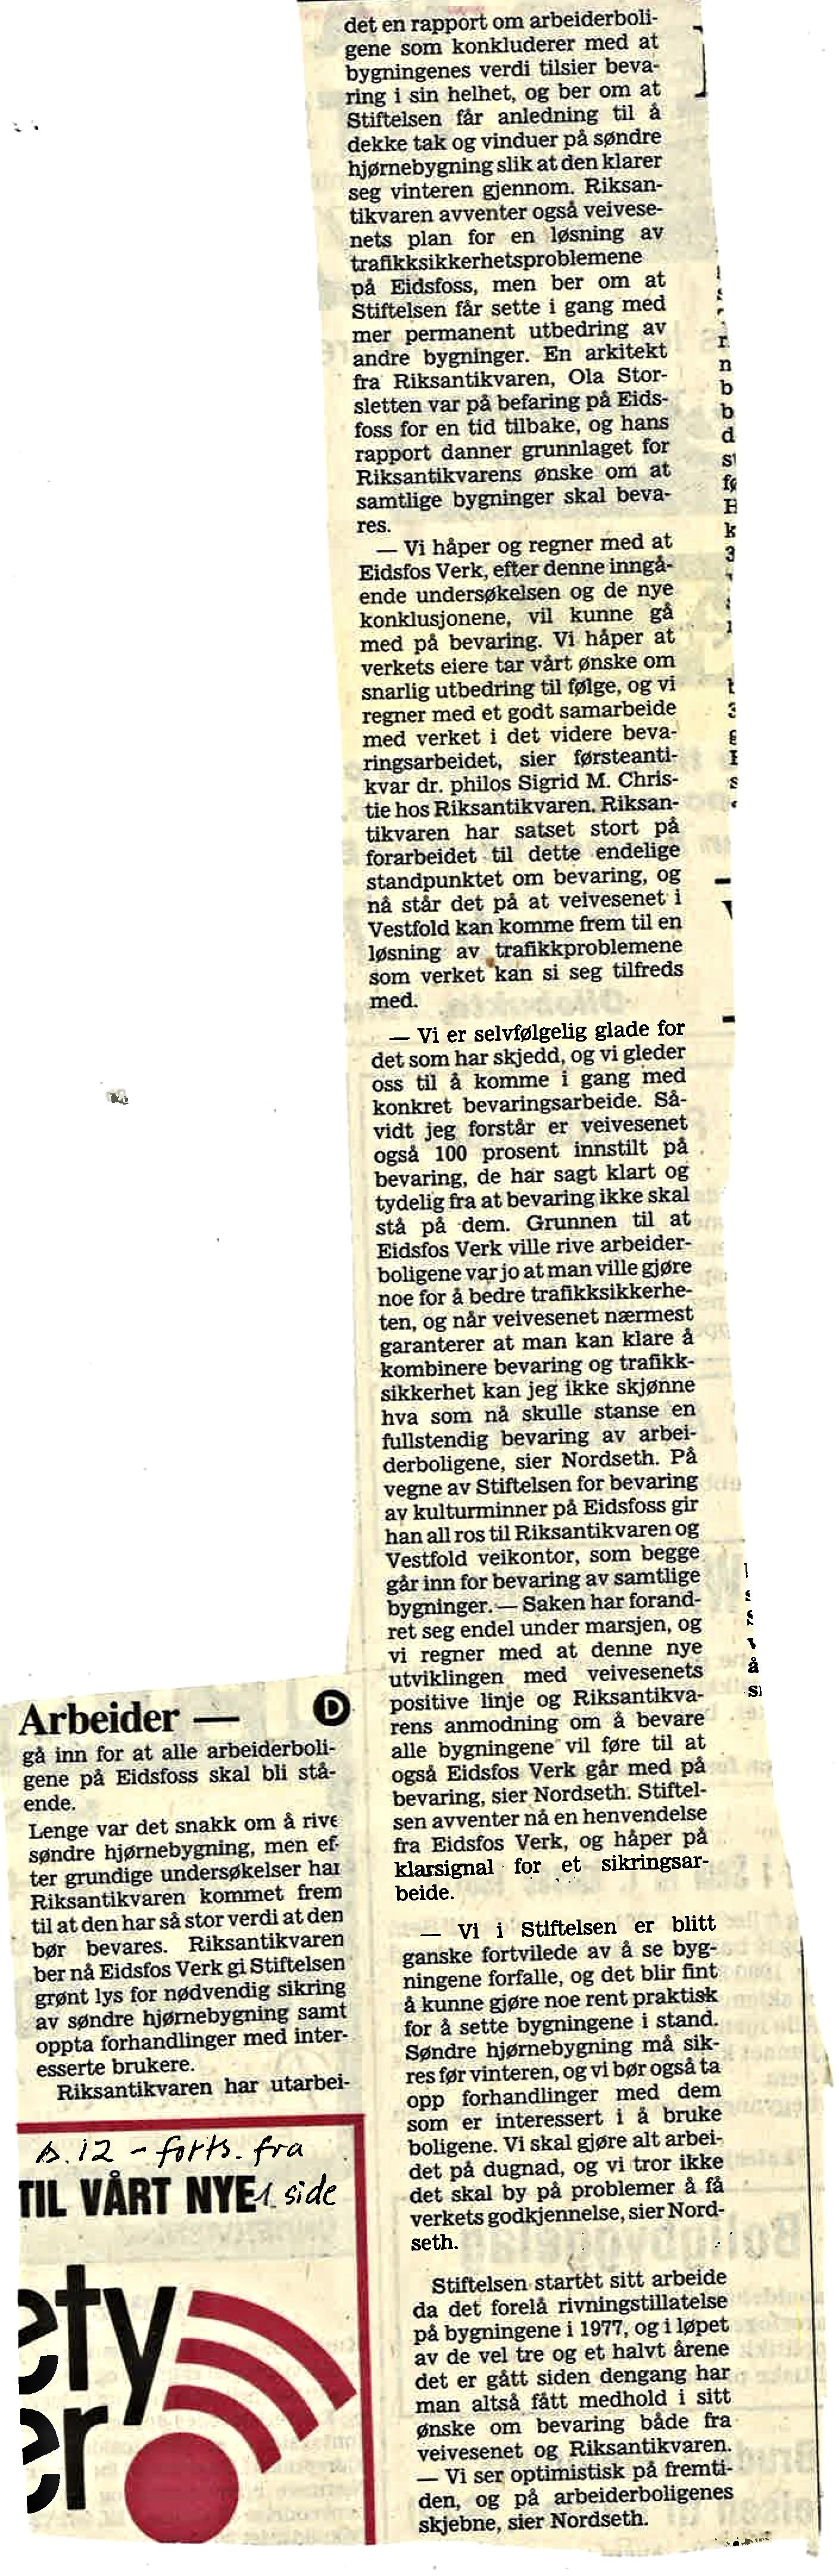 Vestfold Arbeiderblad november 1980